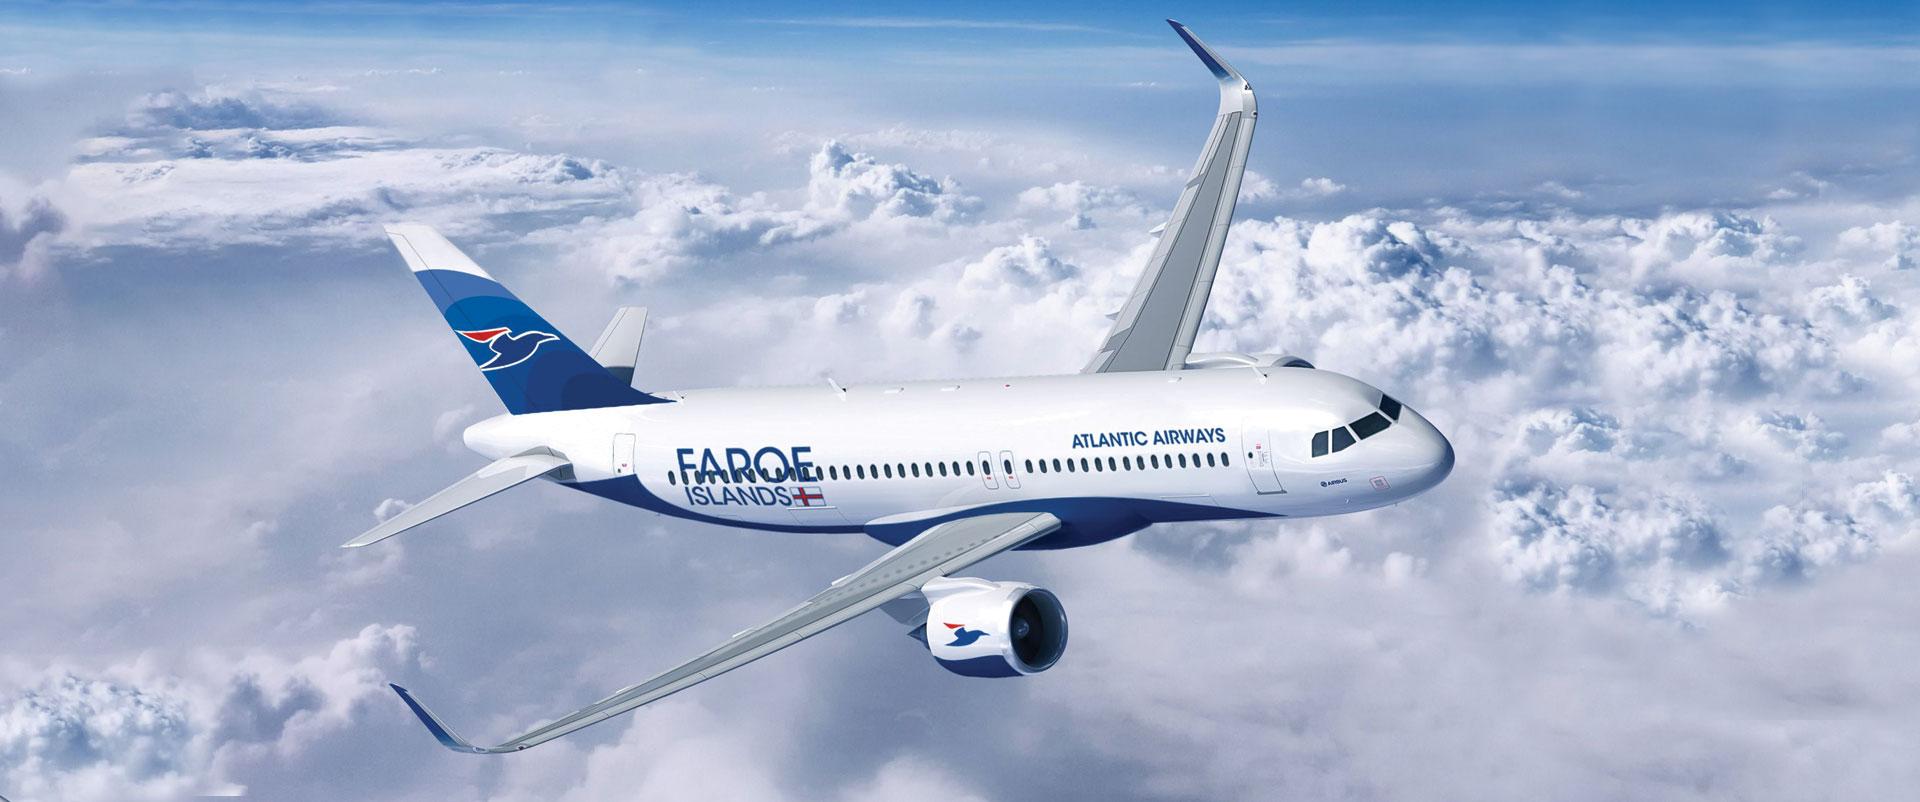 fleet atlantic airways